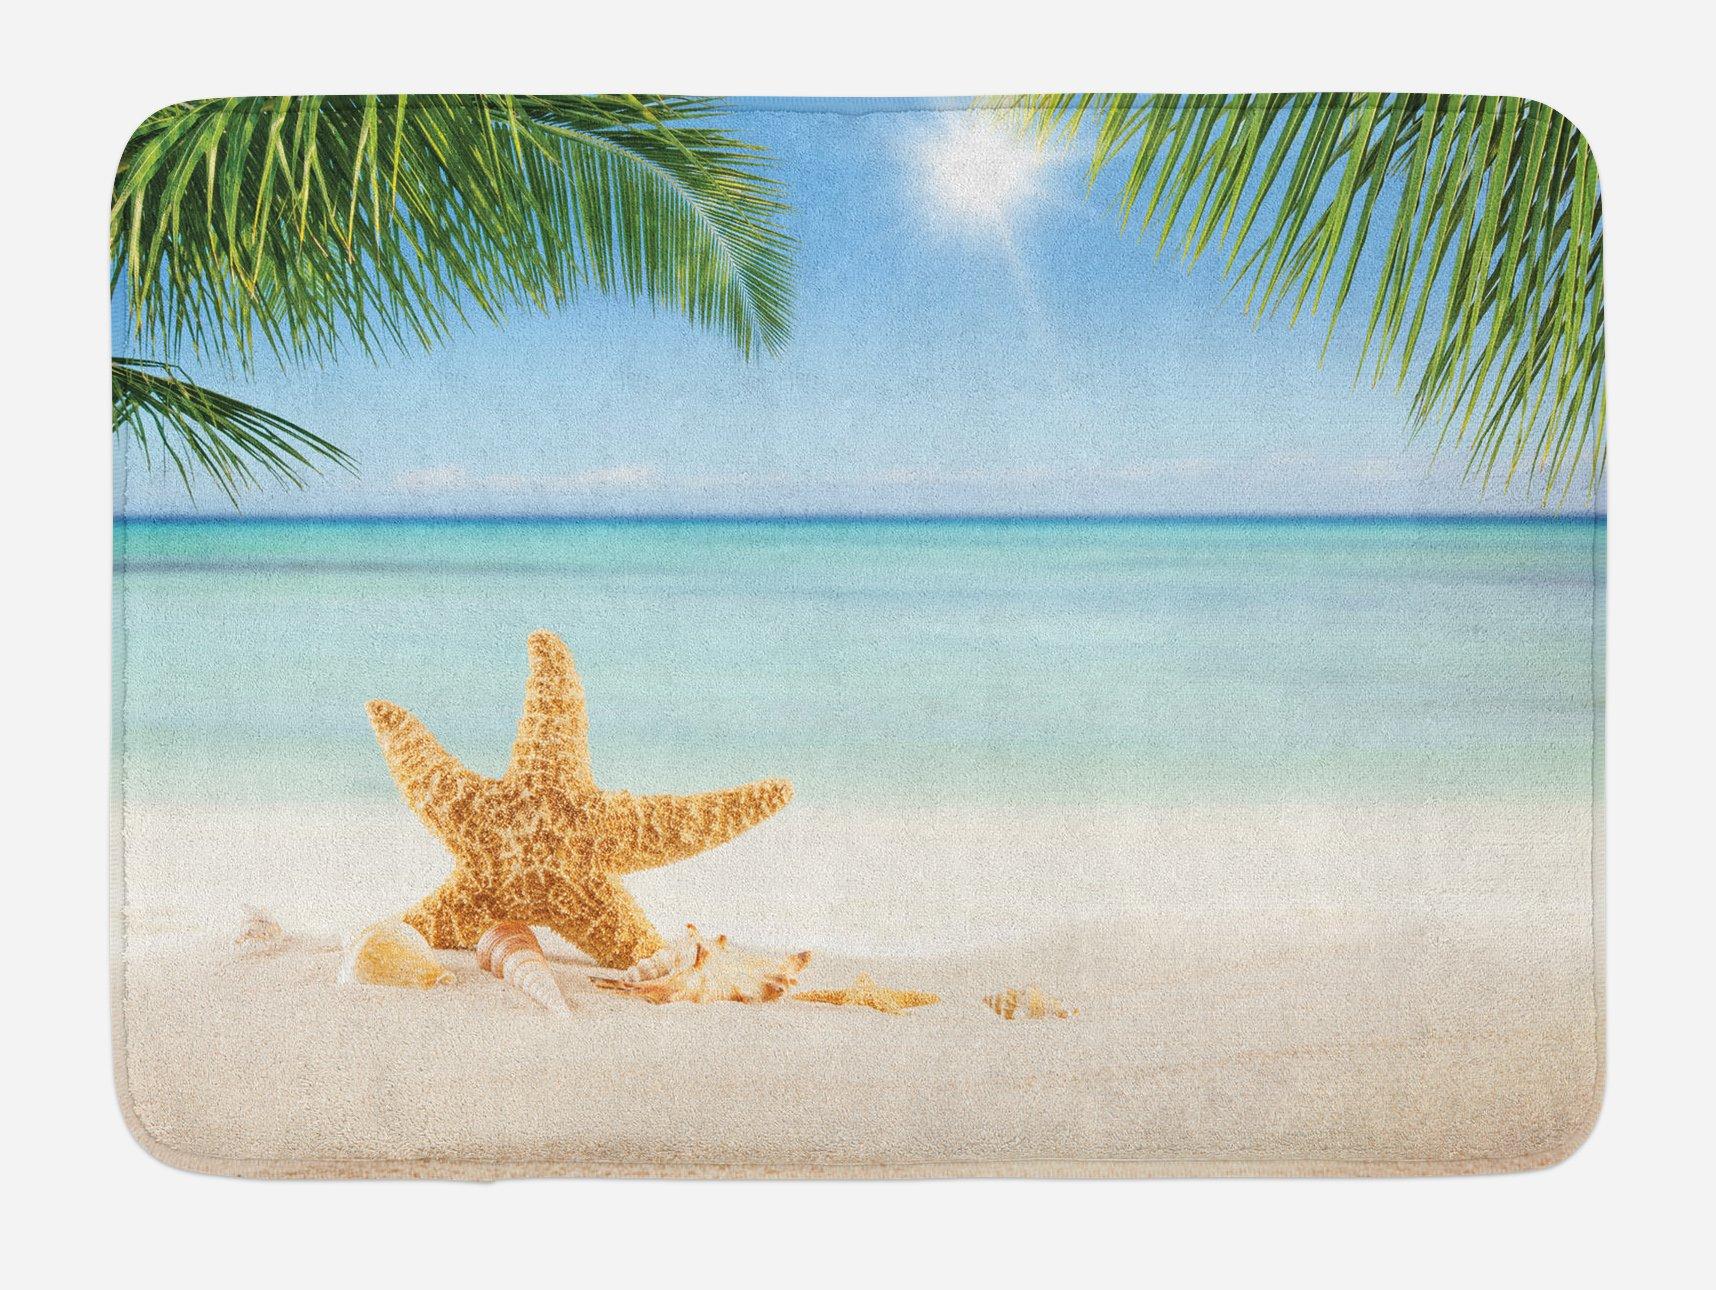 Lunarable Ocean Bath Mat, Graphic of Summer Sandy Beach with Majestic Starfish on Tropical Hawaiian Beach, Plush Bathroom Decor Mat with Non Slip Backing, 29.5 W X 17.5 W Inches, Cream Blue Green